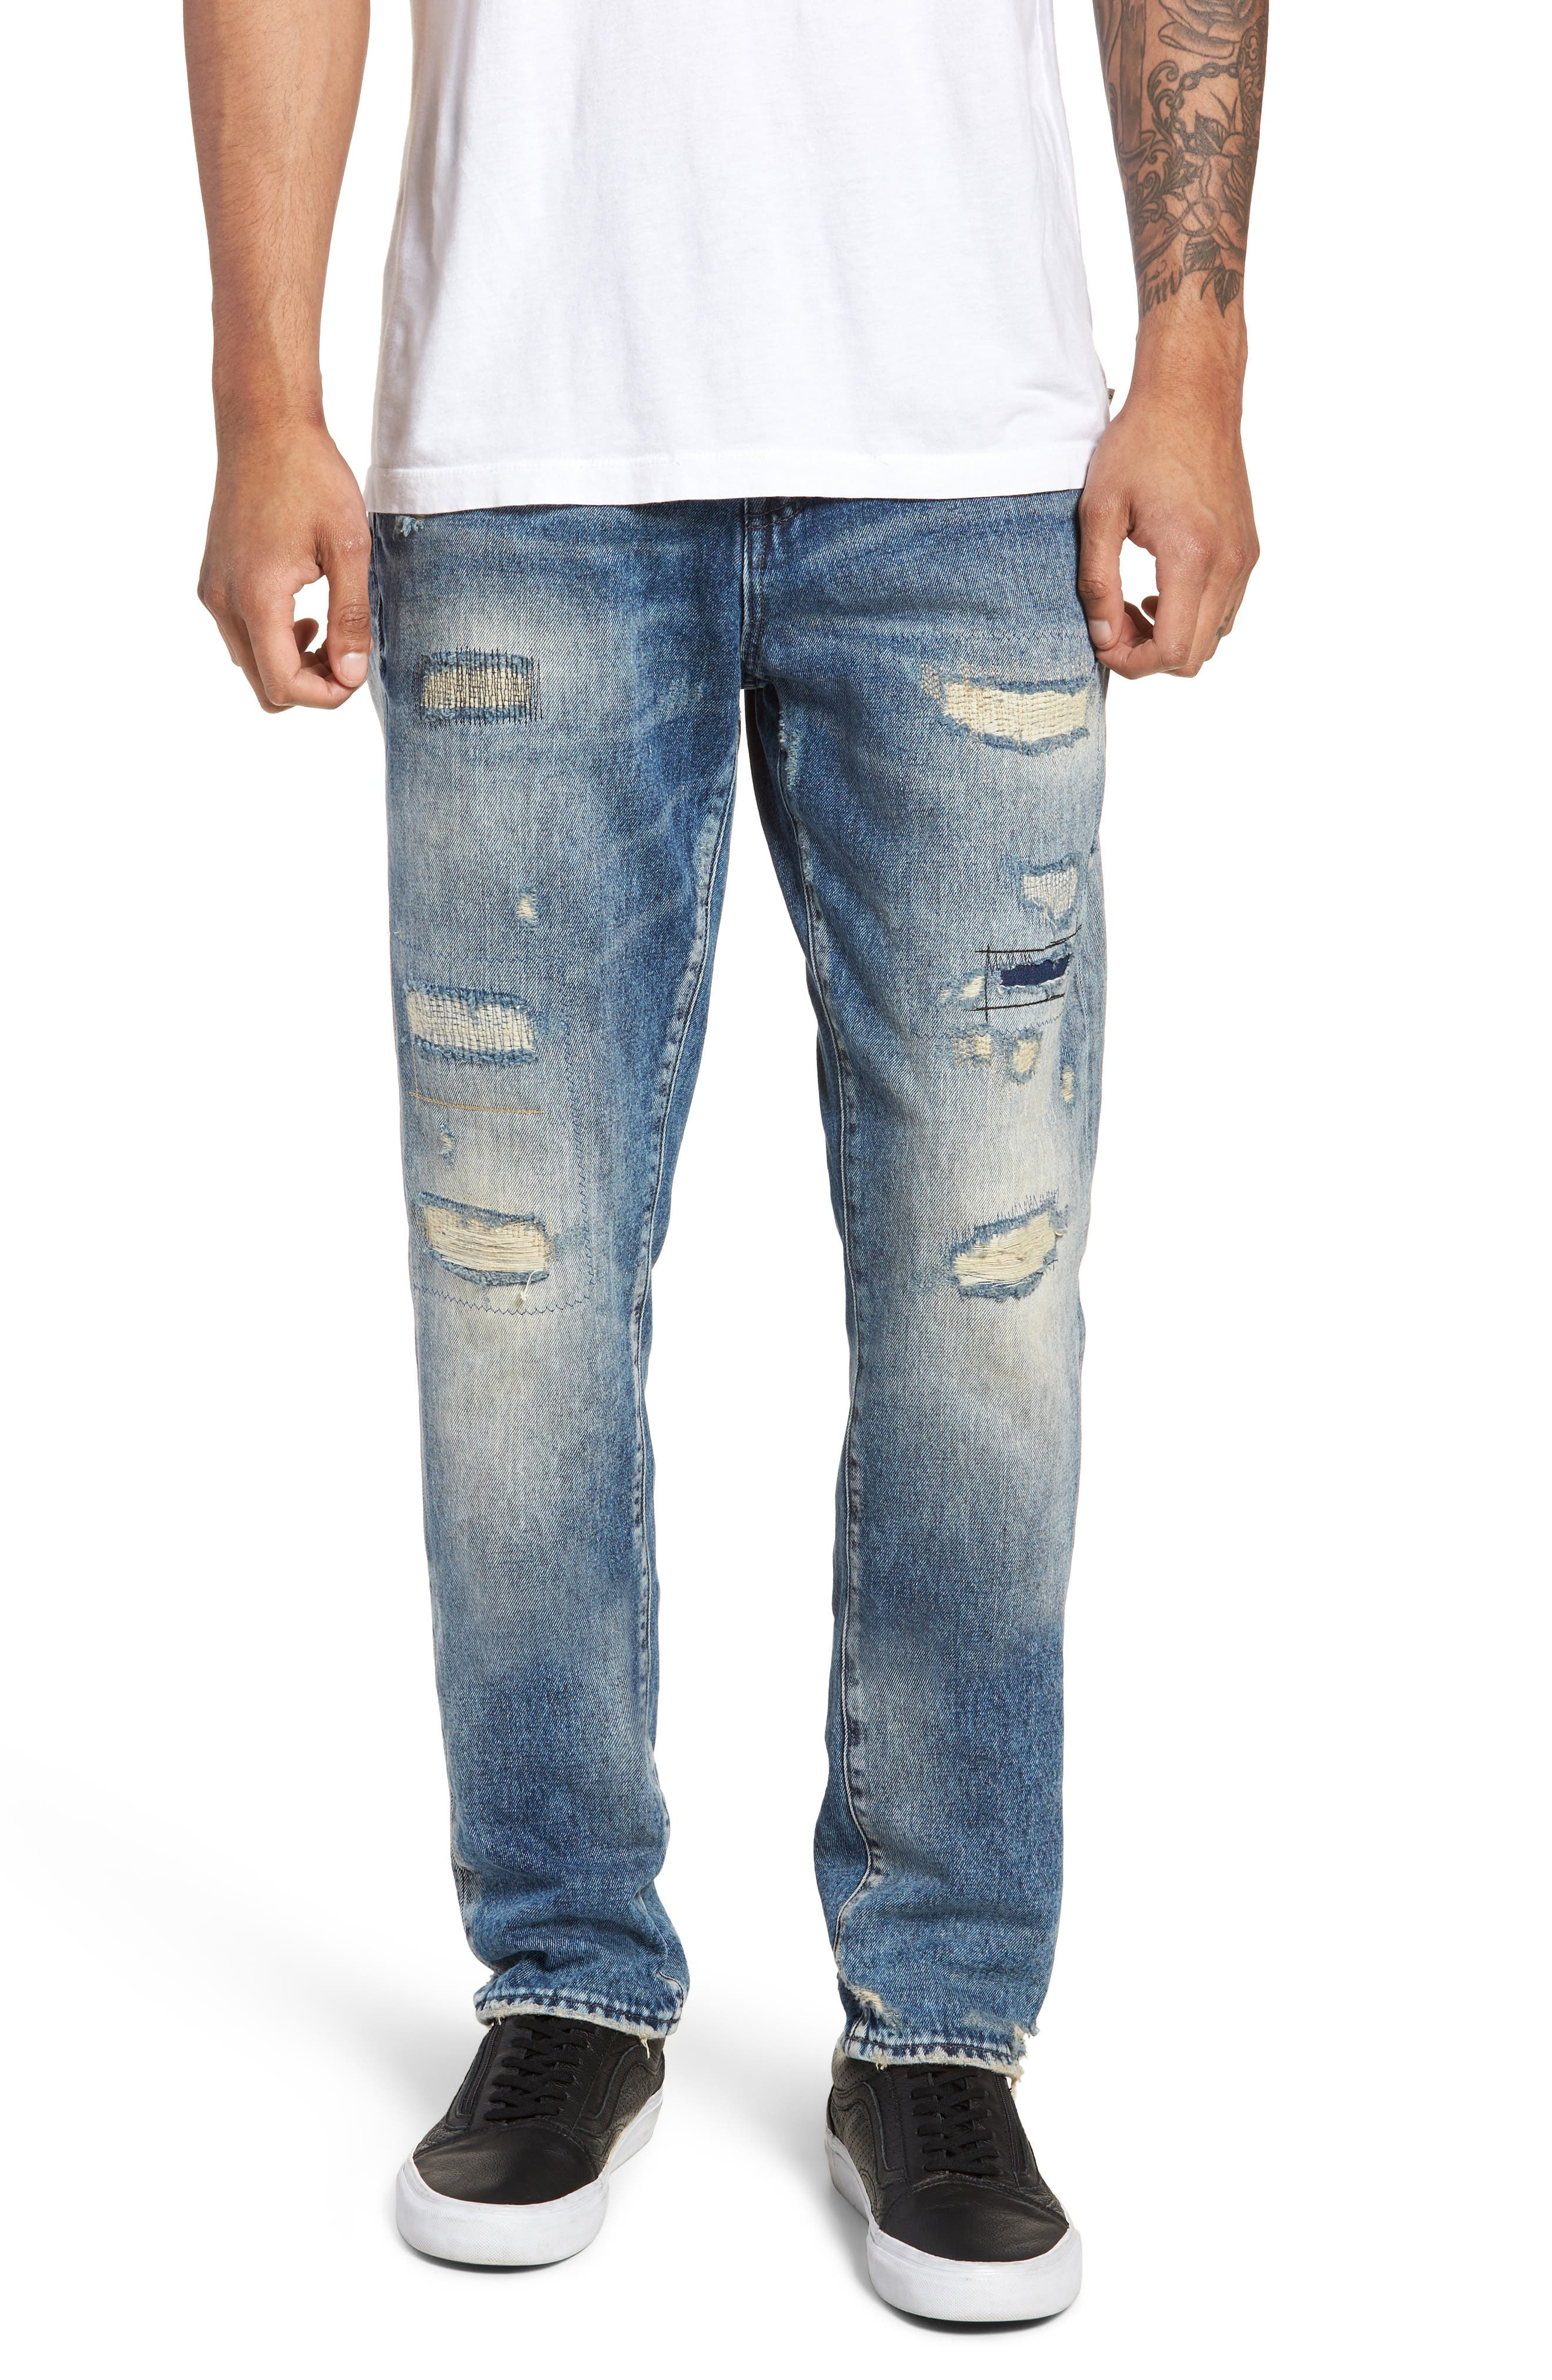 Demon Slim Straight Leg Jeans,                             Main thumbnail 1, color,                             MEXICO